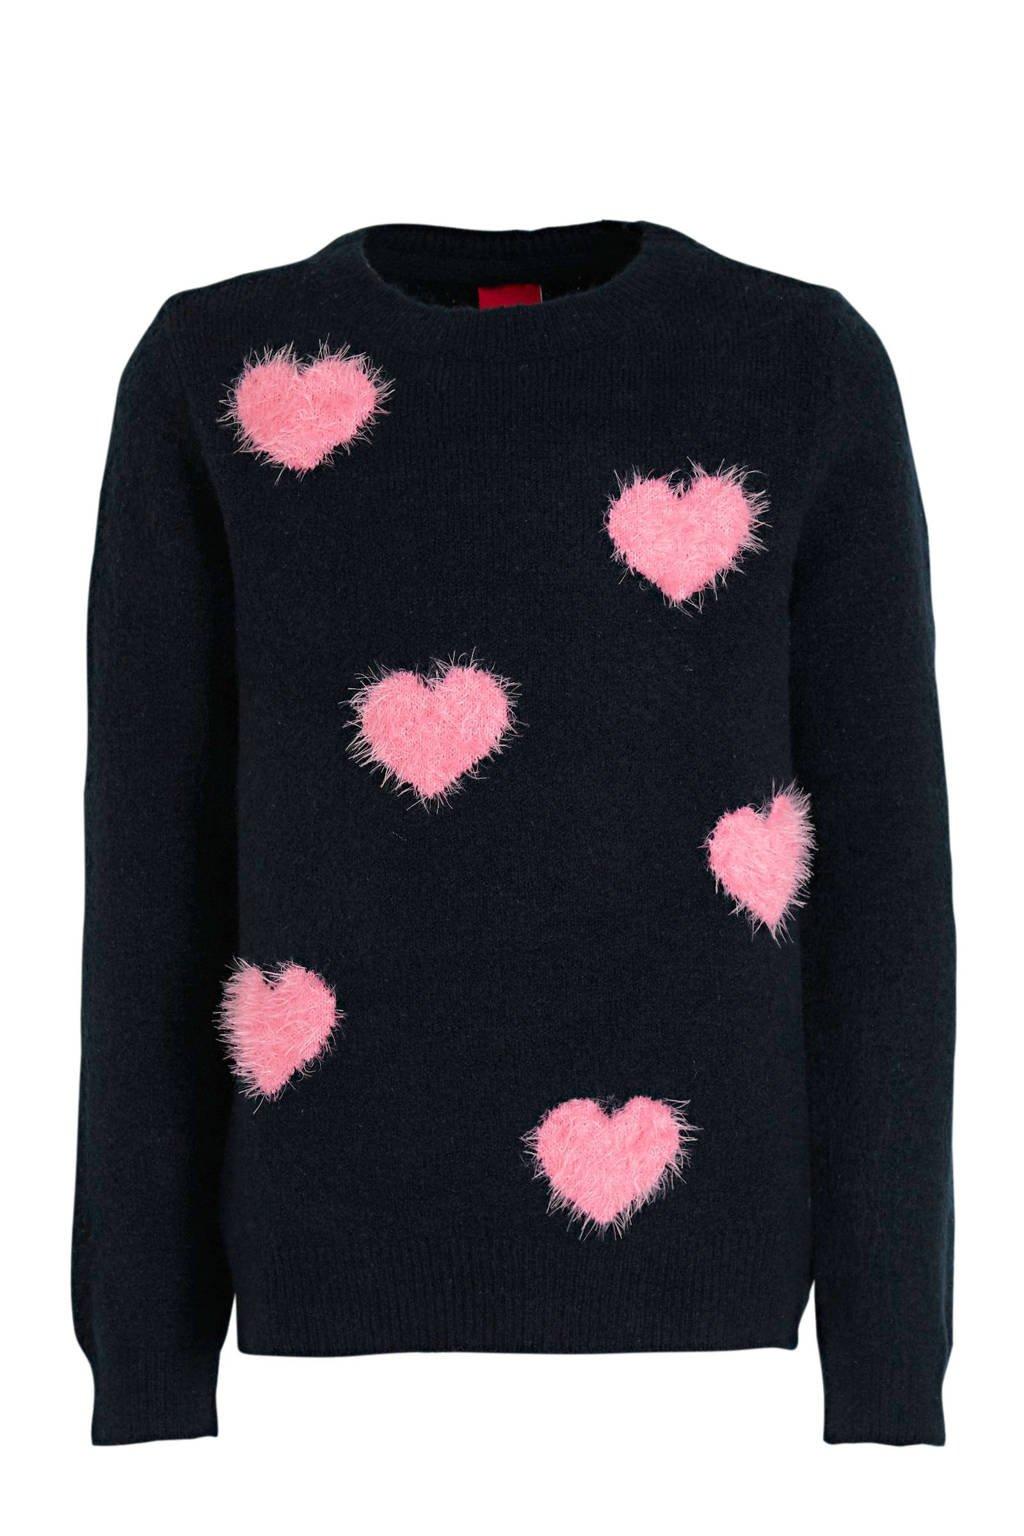 s.Oliver trui donkerblauw/roze, Donkerblauw/roze